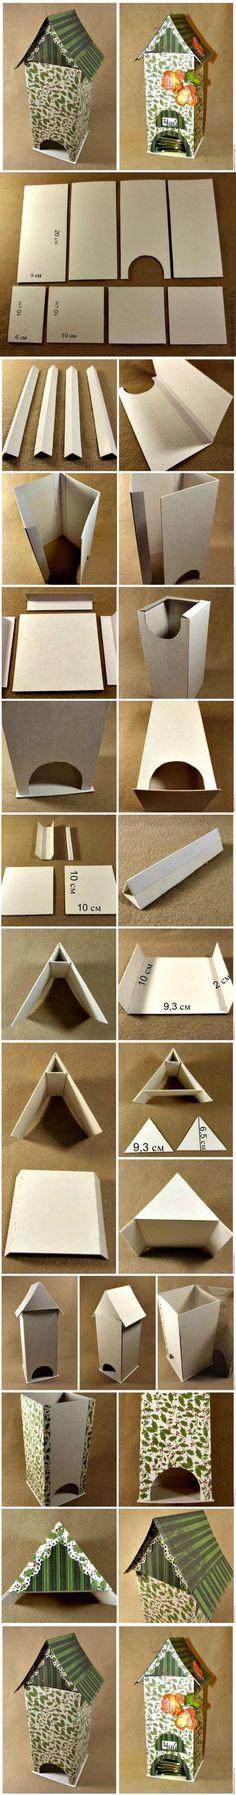 DIY Cardboard Tea Bag Dispenser: